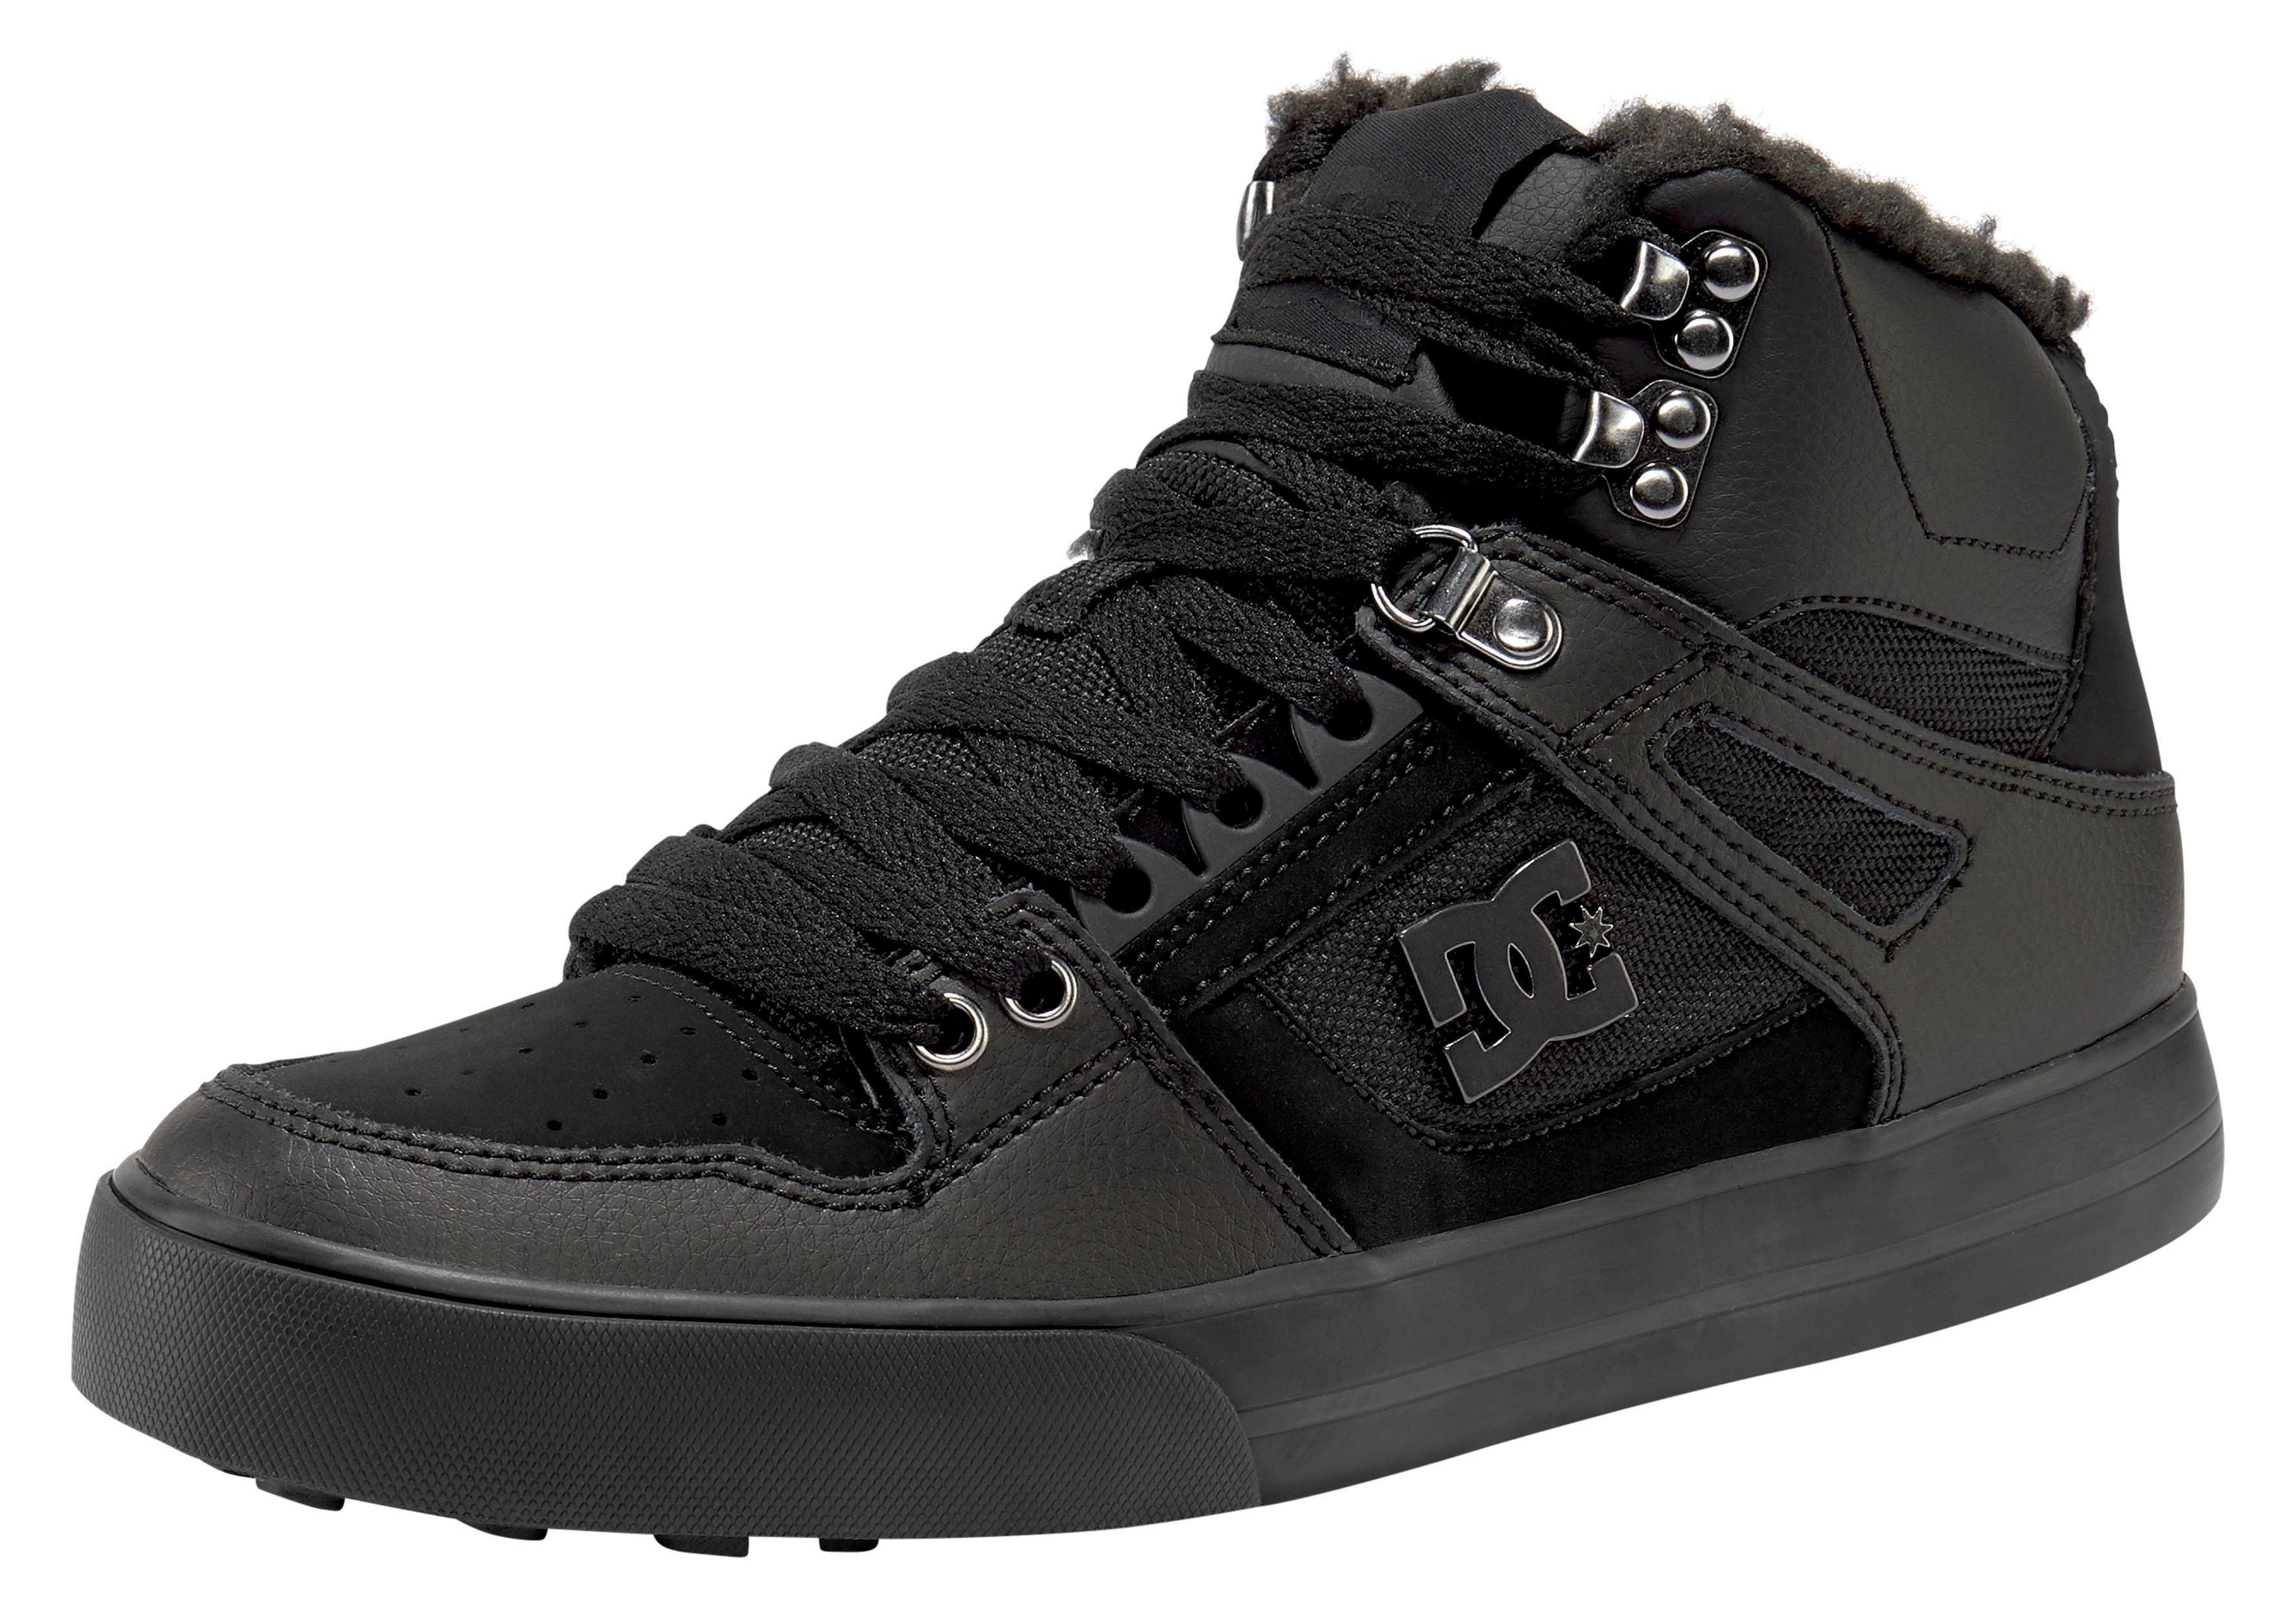 Online Sneakerspure Wc Dc Top Verkrijgbaar Wnt Shoes High l1KJTFc